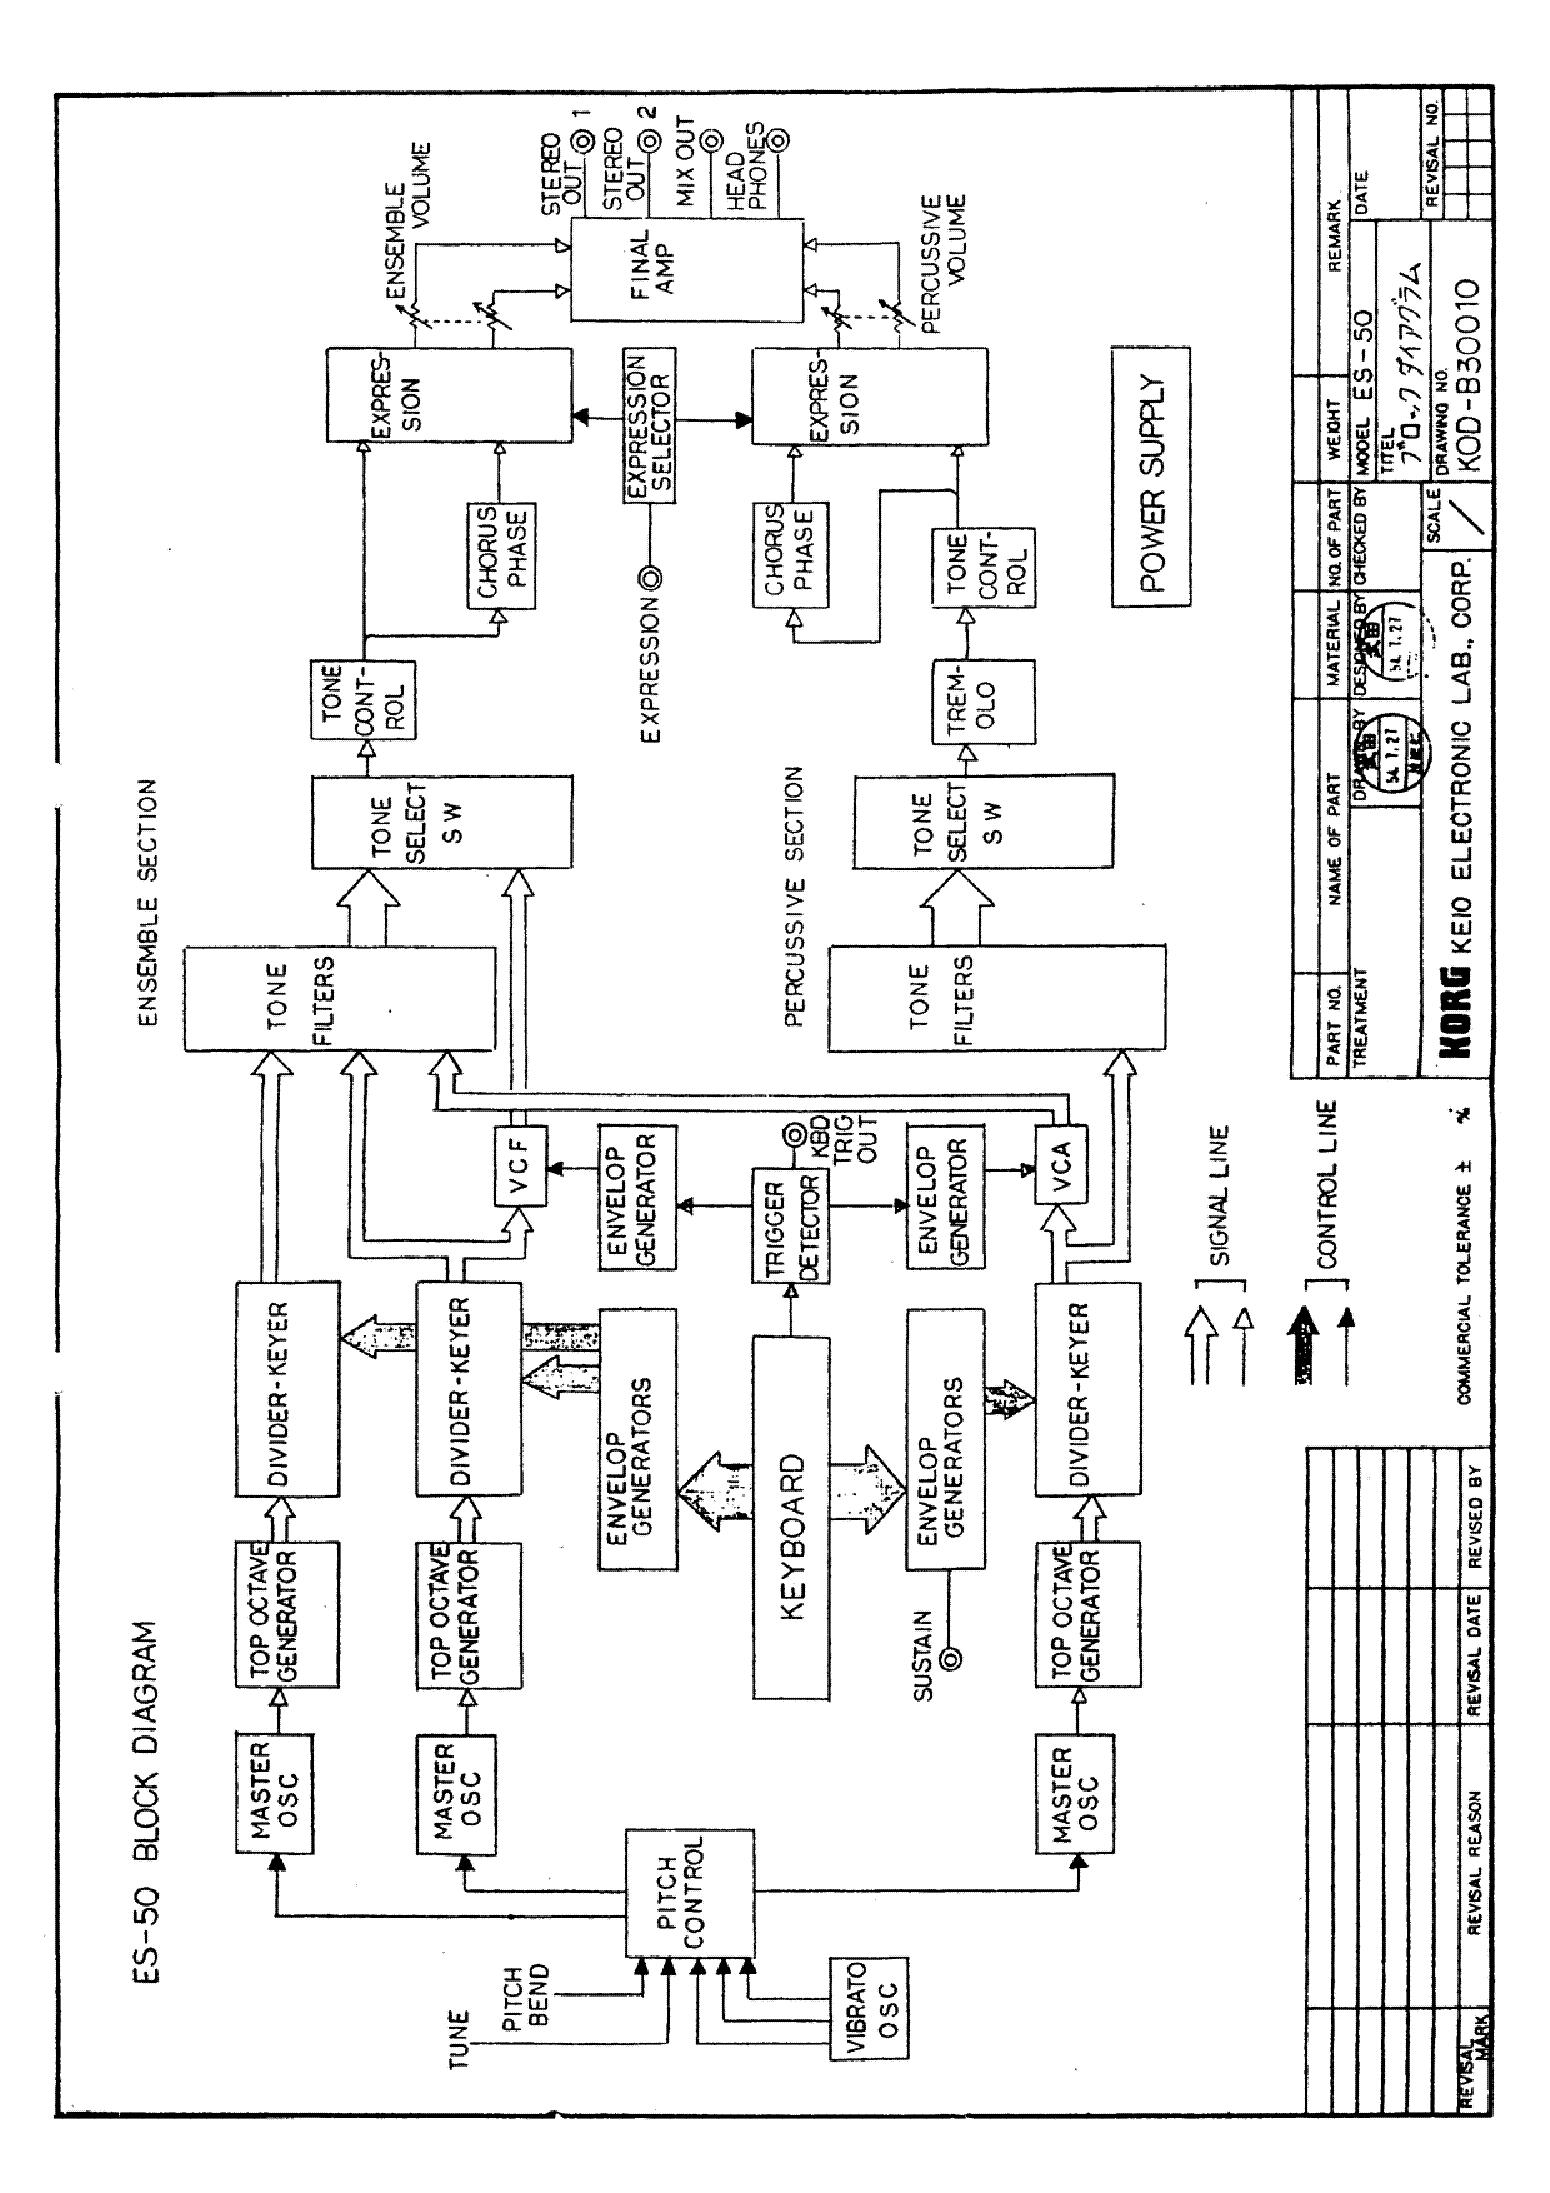 delta electronics power supply schematics lucent power